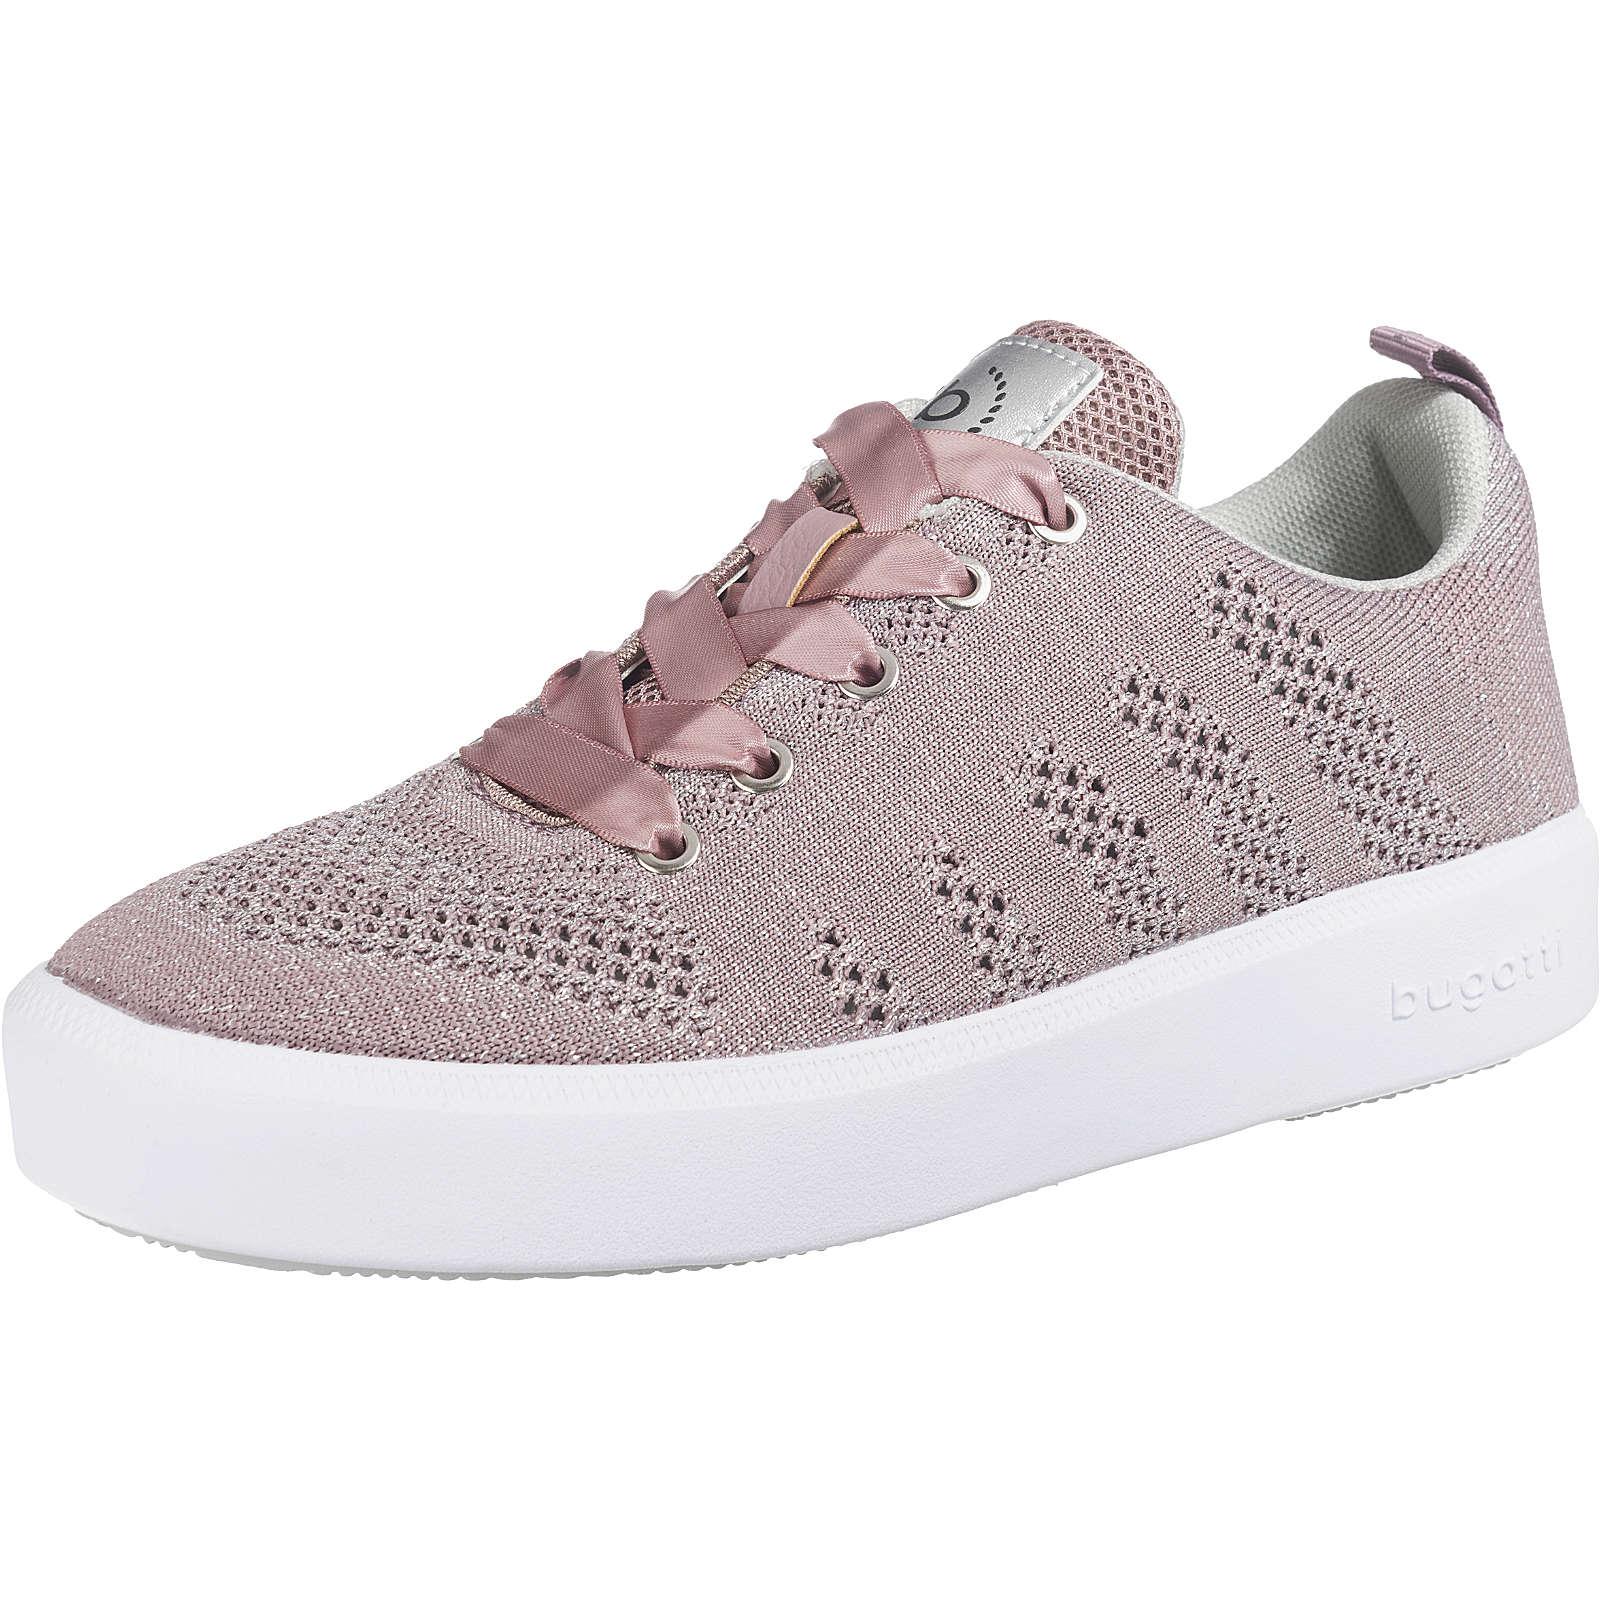 bugatti Sneakers Low rosa Damen Gr. 39